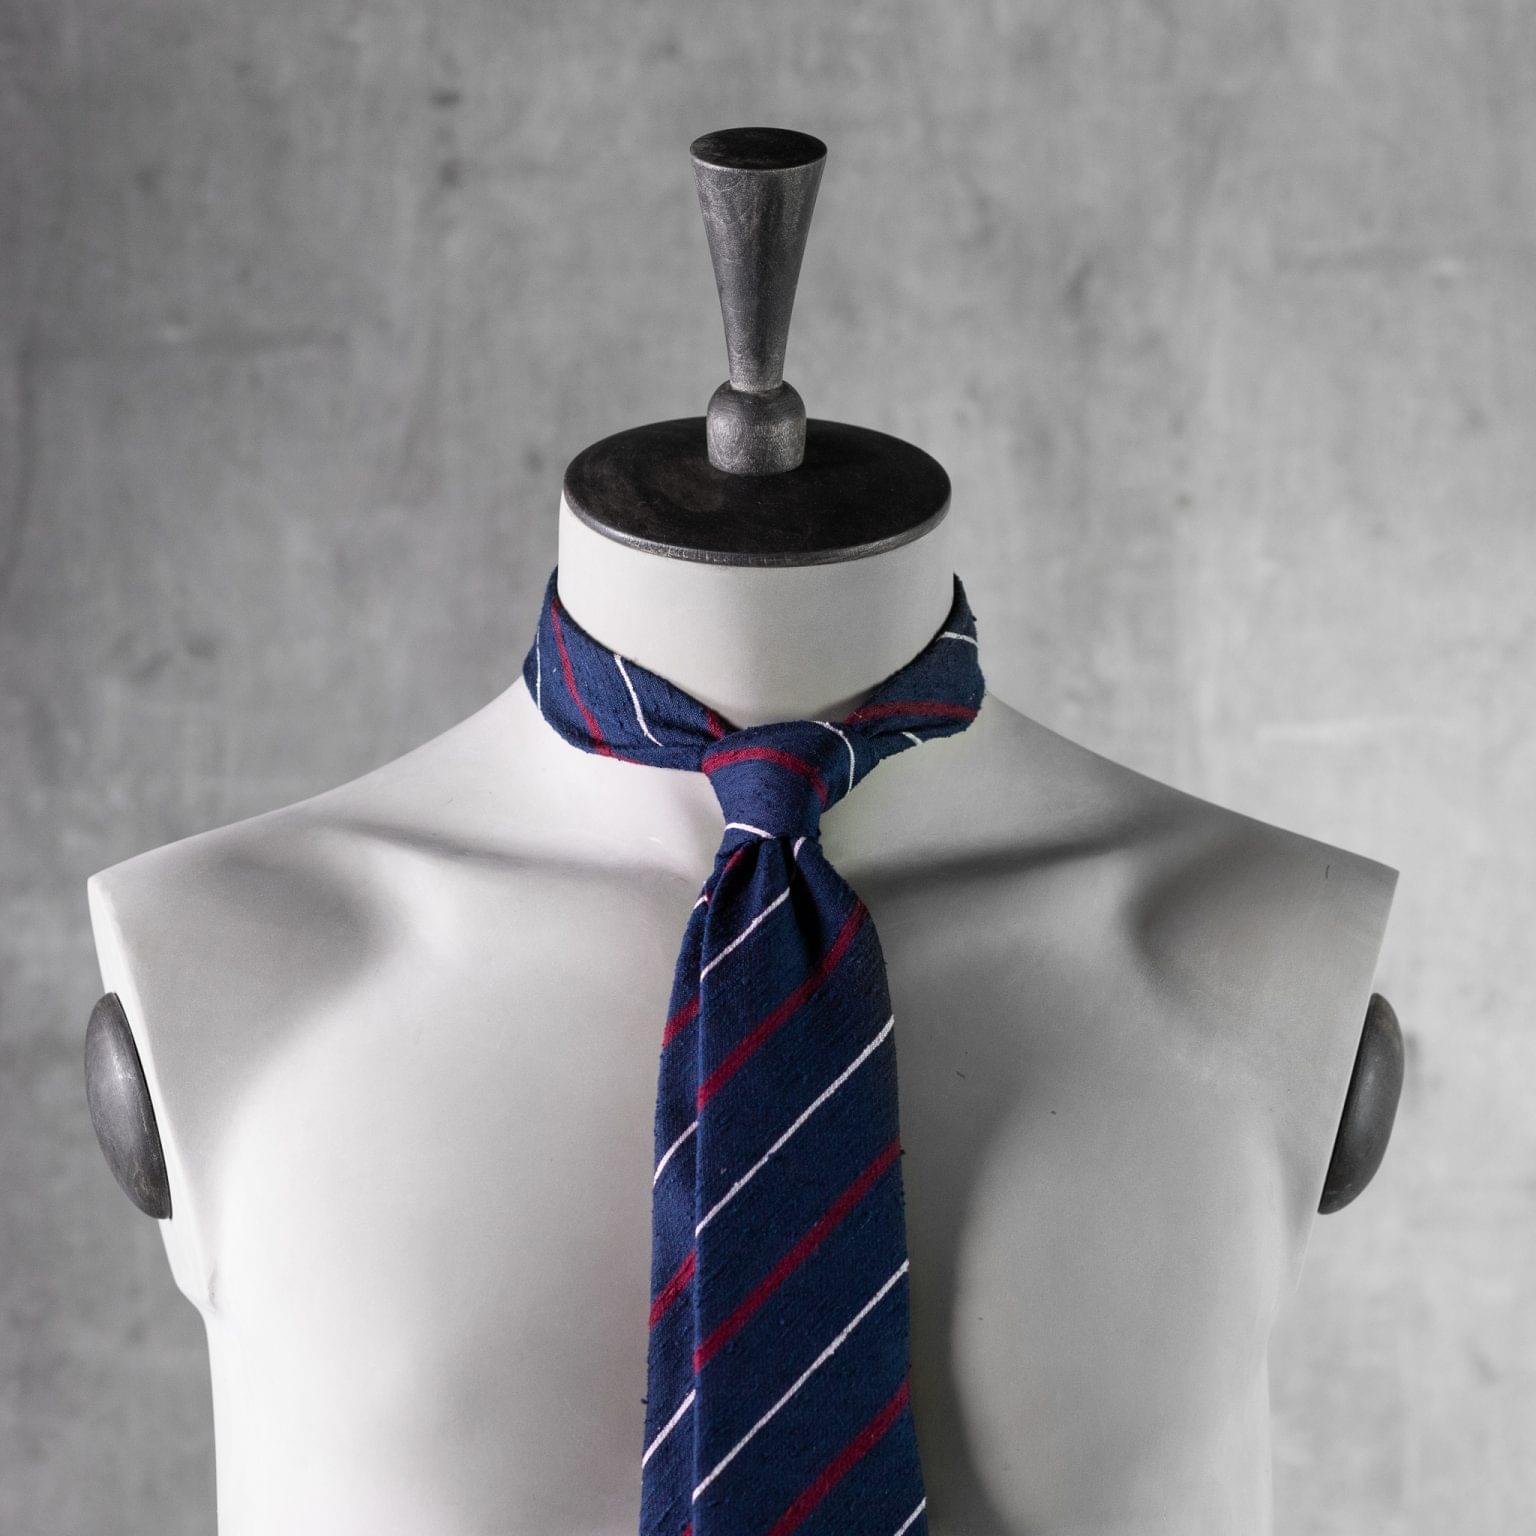 SHANTUNG-0525-Tie-Initials-Corbata-Iniciales-The-Seelk-3